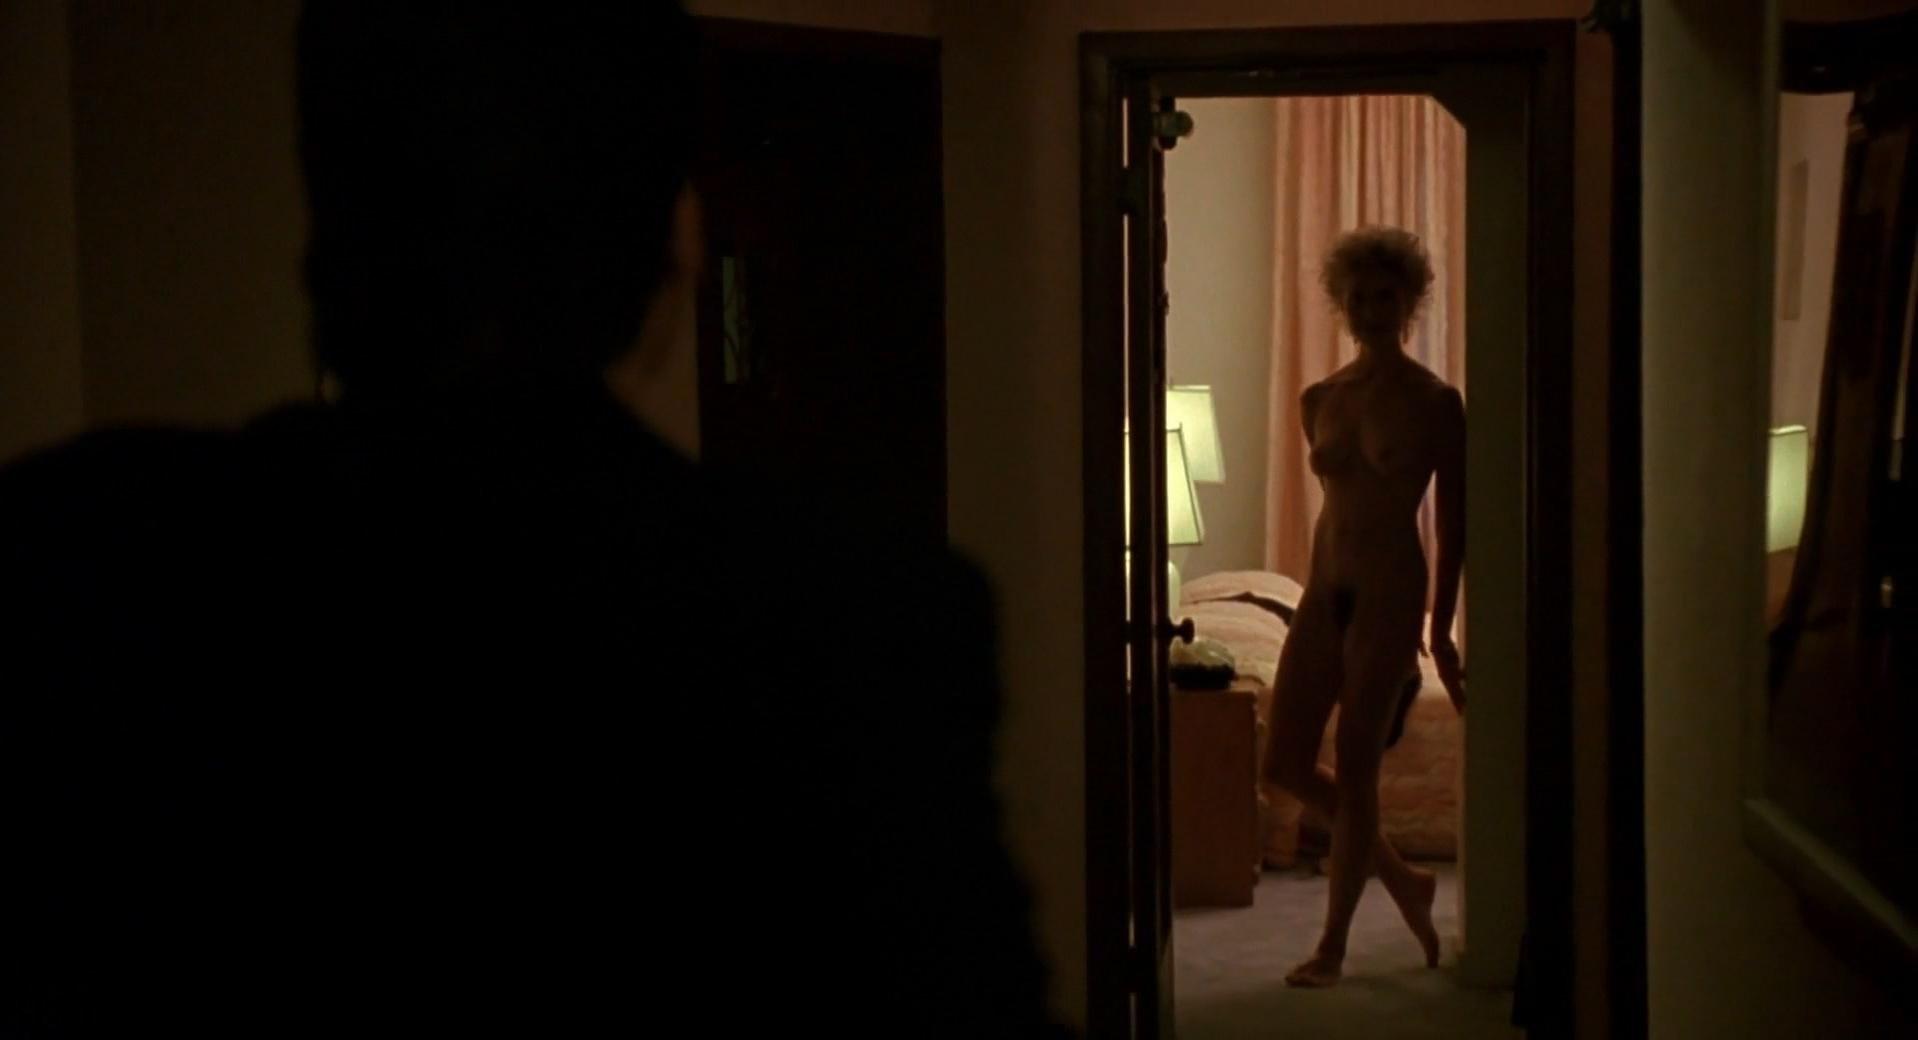 Annette bening naked pics logically